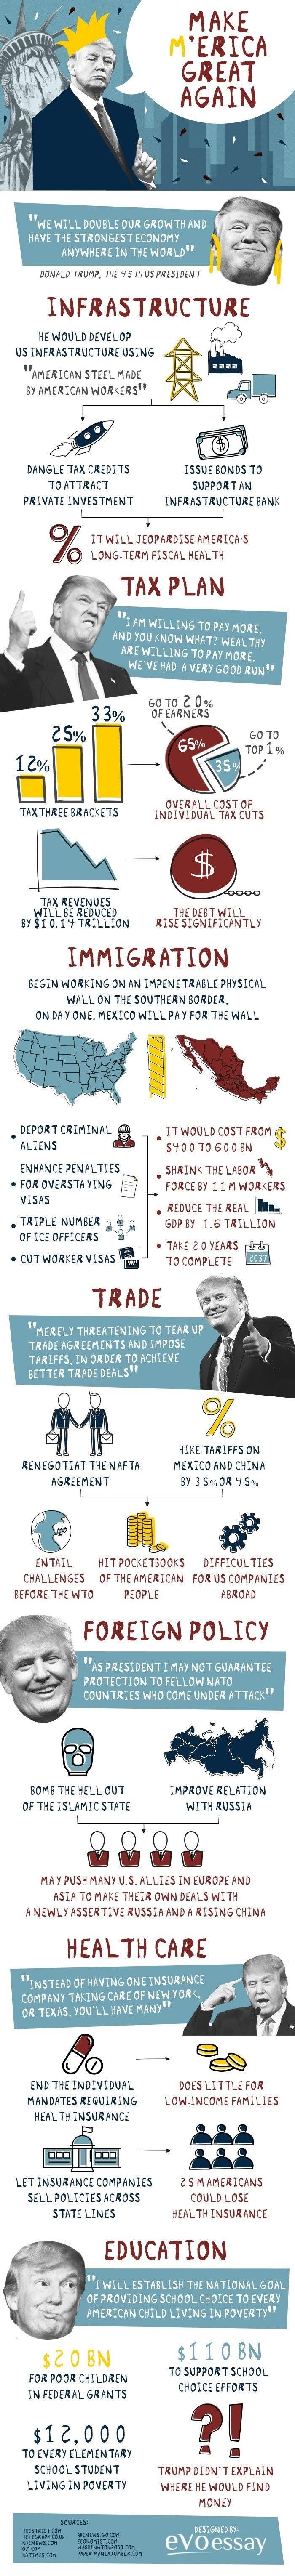 Make America Great Again? #infographic